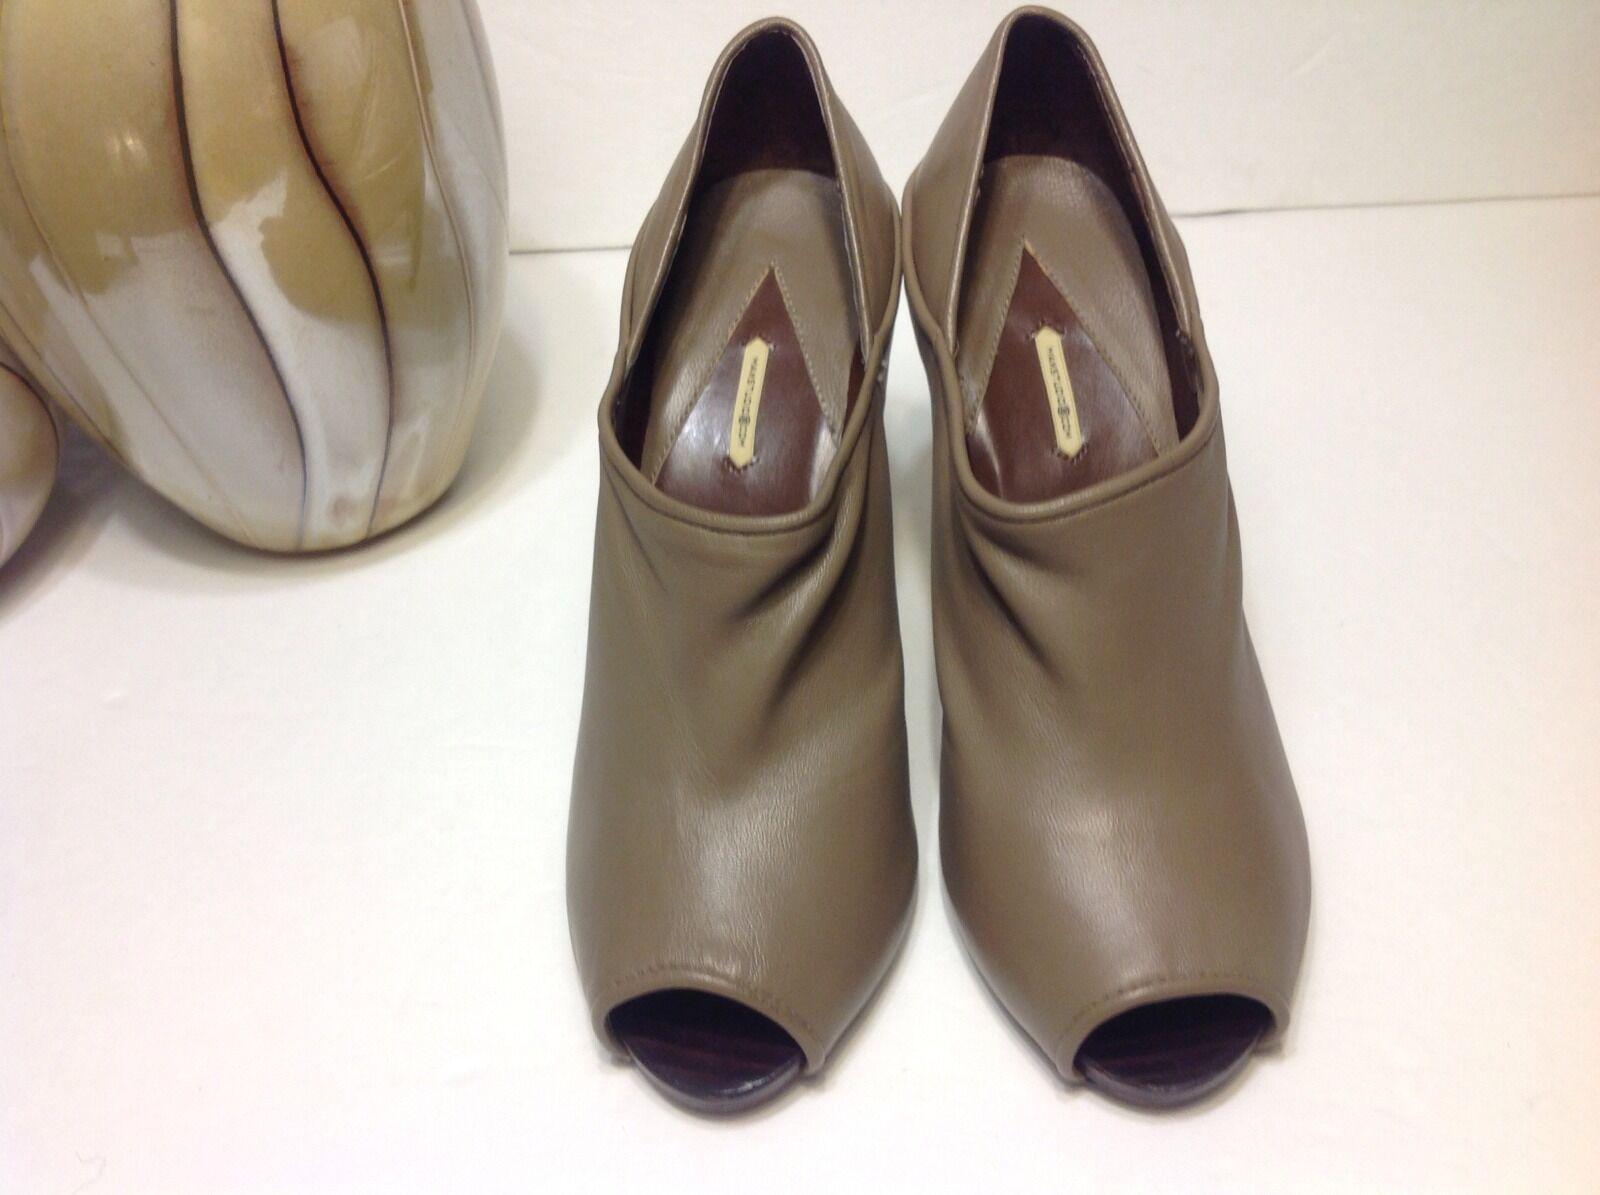 MAX STUDIO XIAN NWOB Größe 8.5 165 taupe Damens's peep toe heels booties